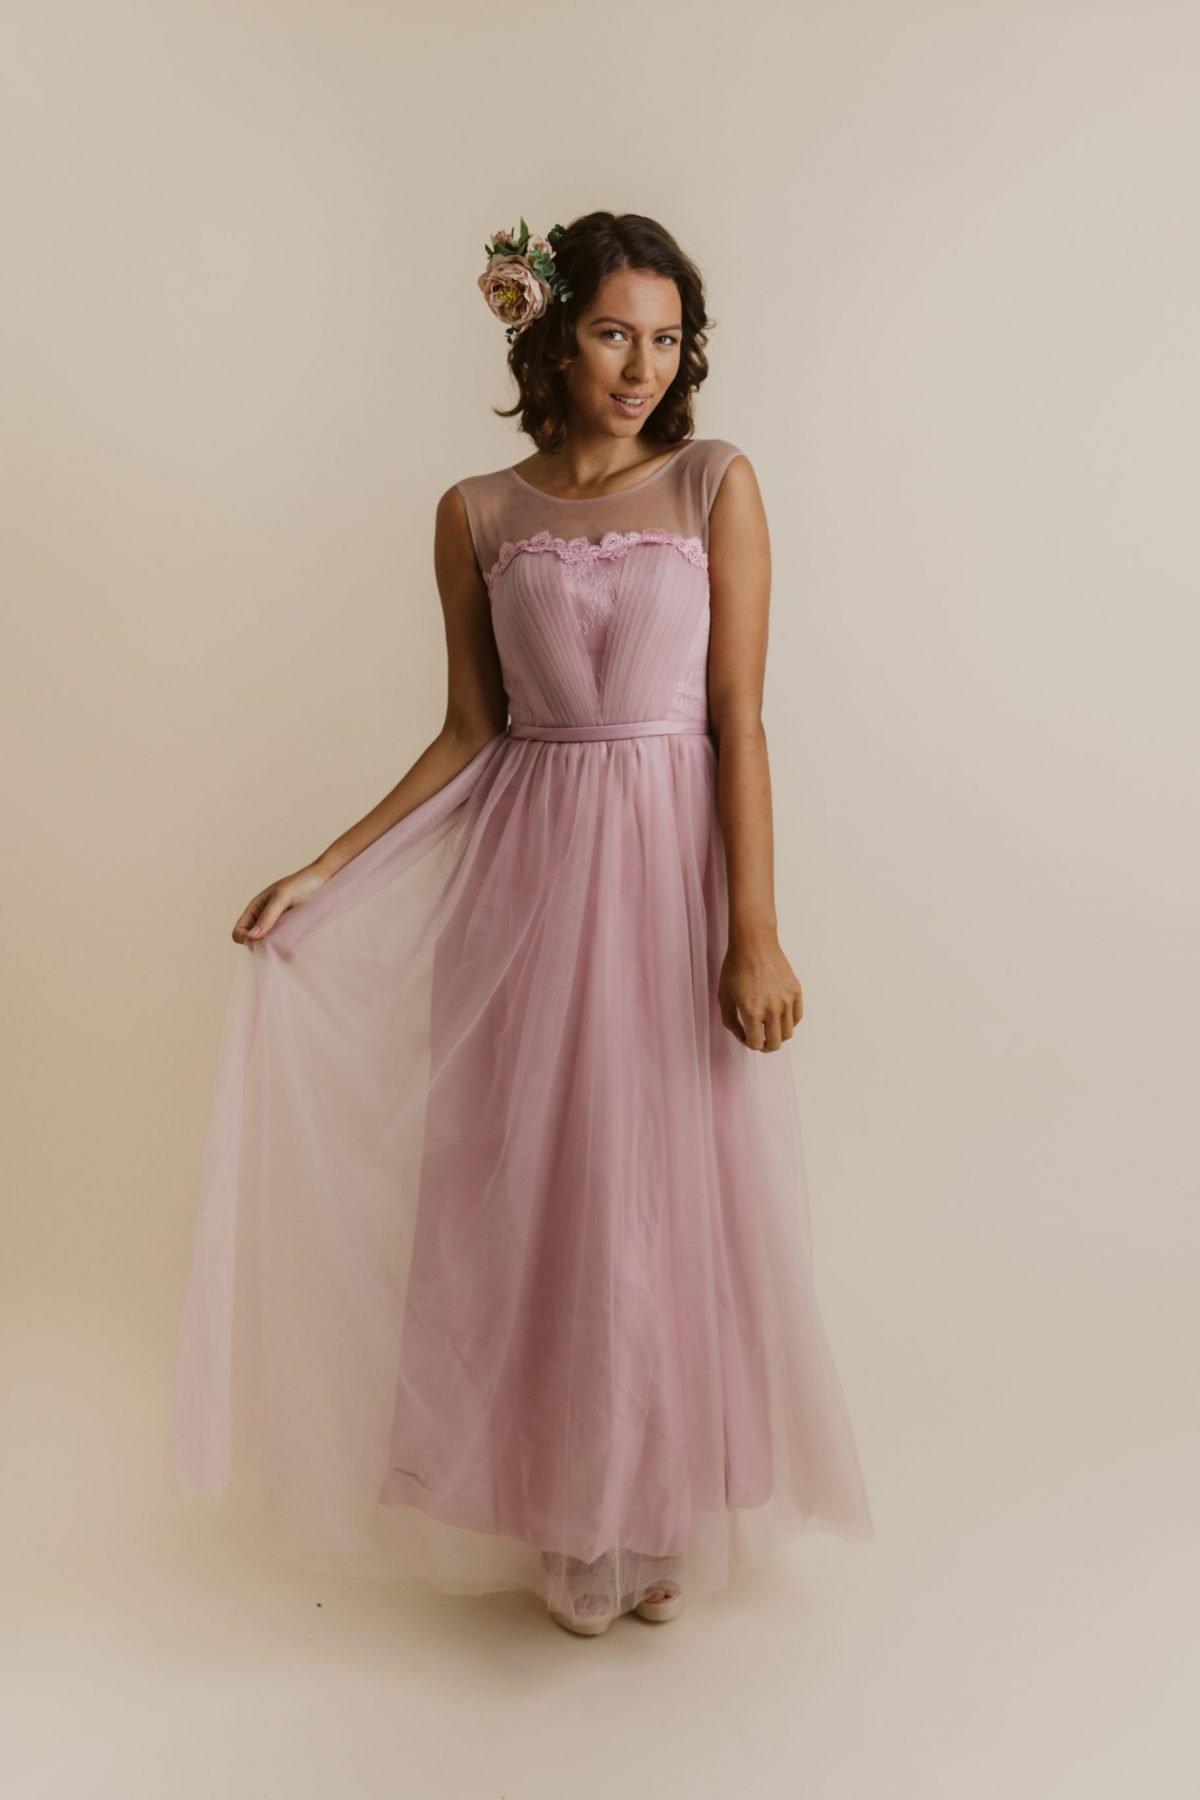 Tulle Bridesmaid Dresses NZ